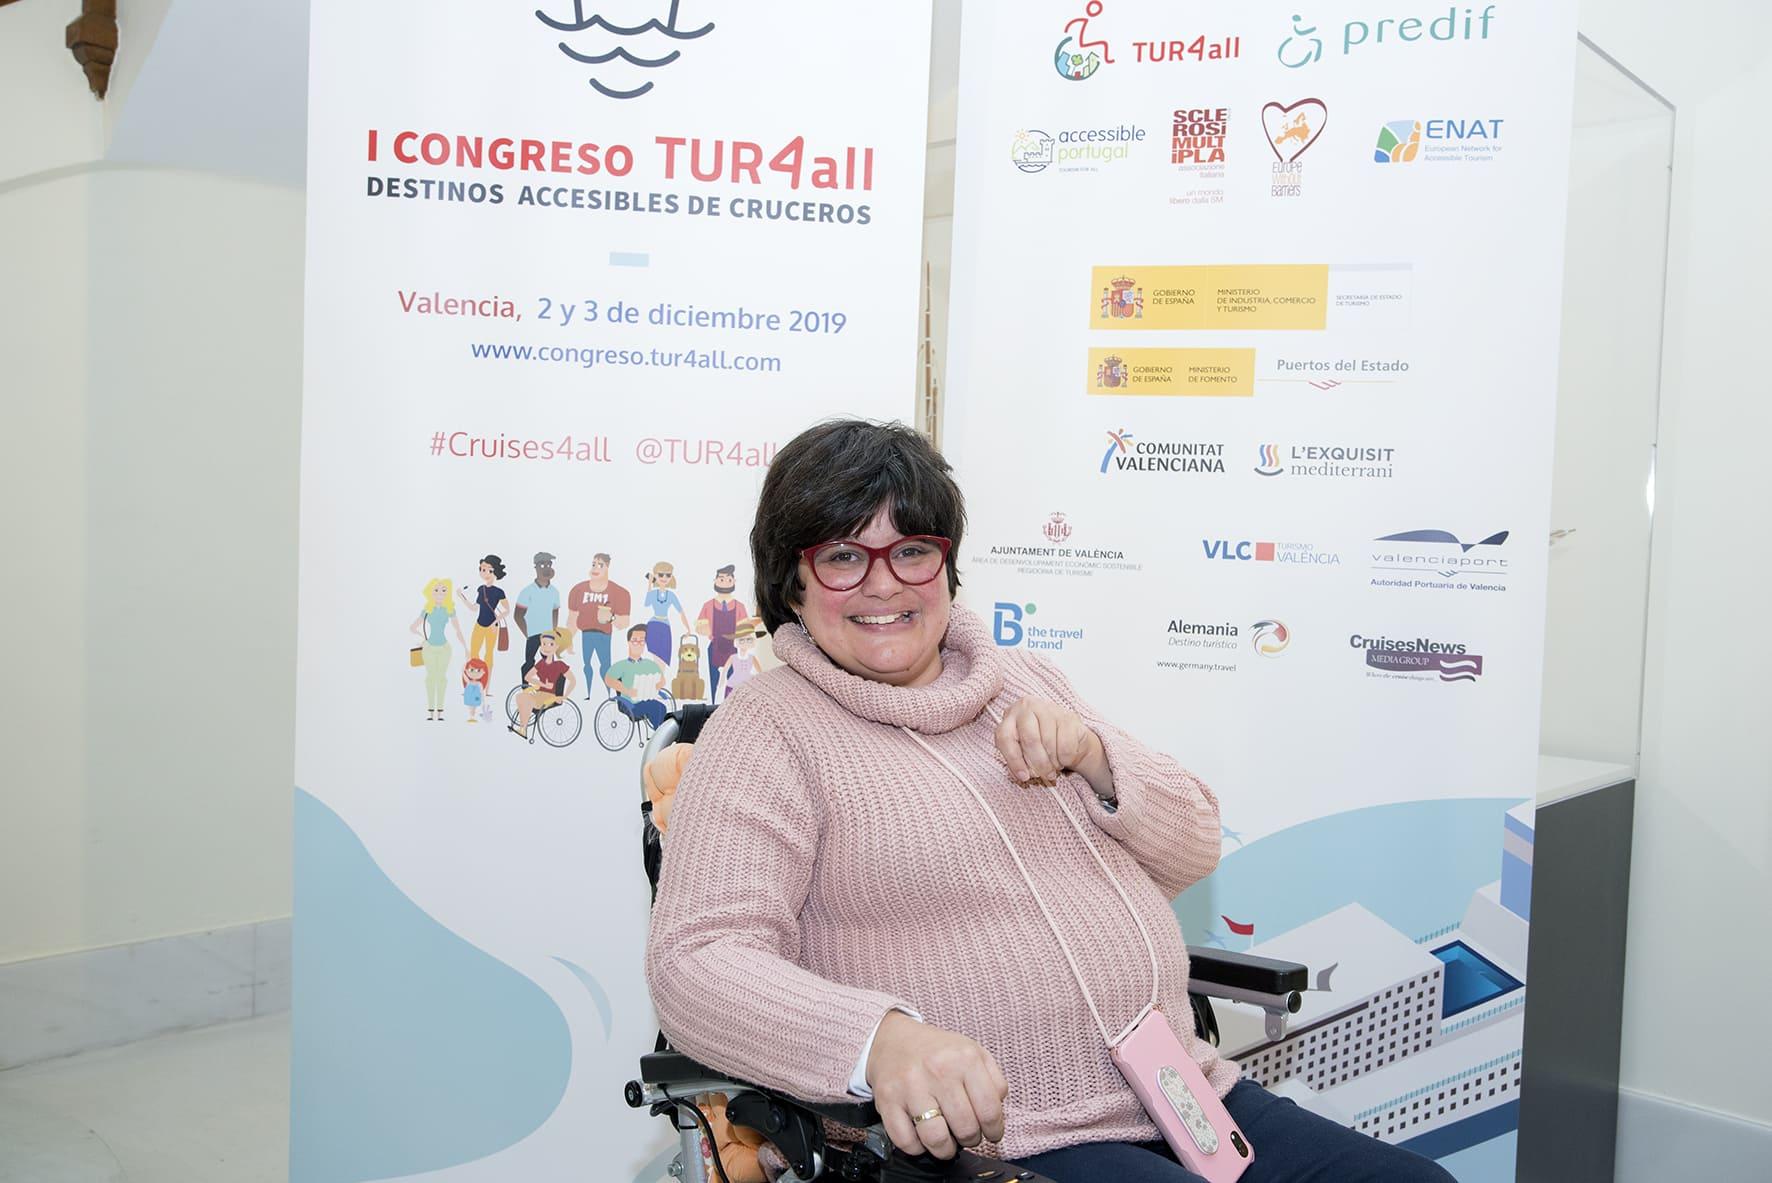 Laura Soler_Les Corts Valencianes